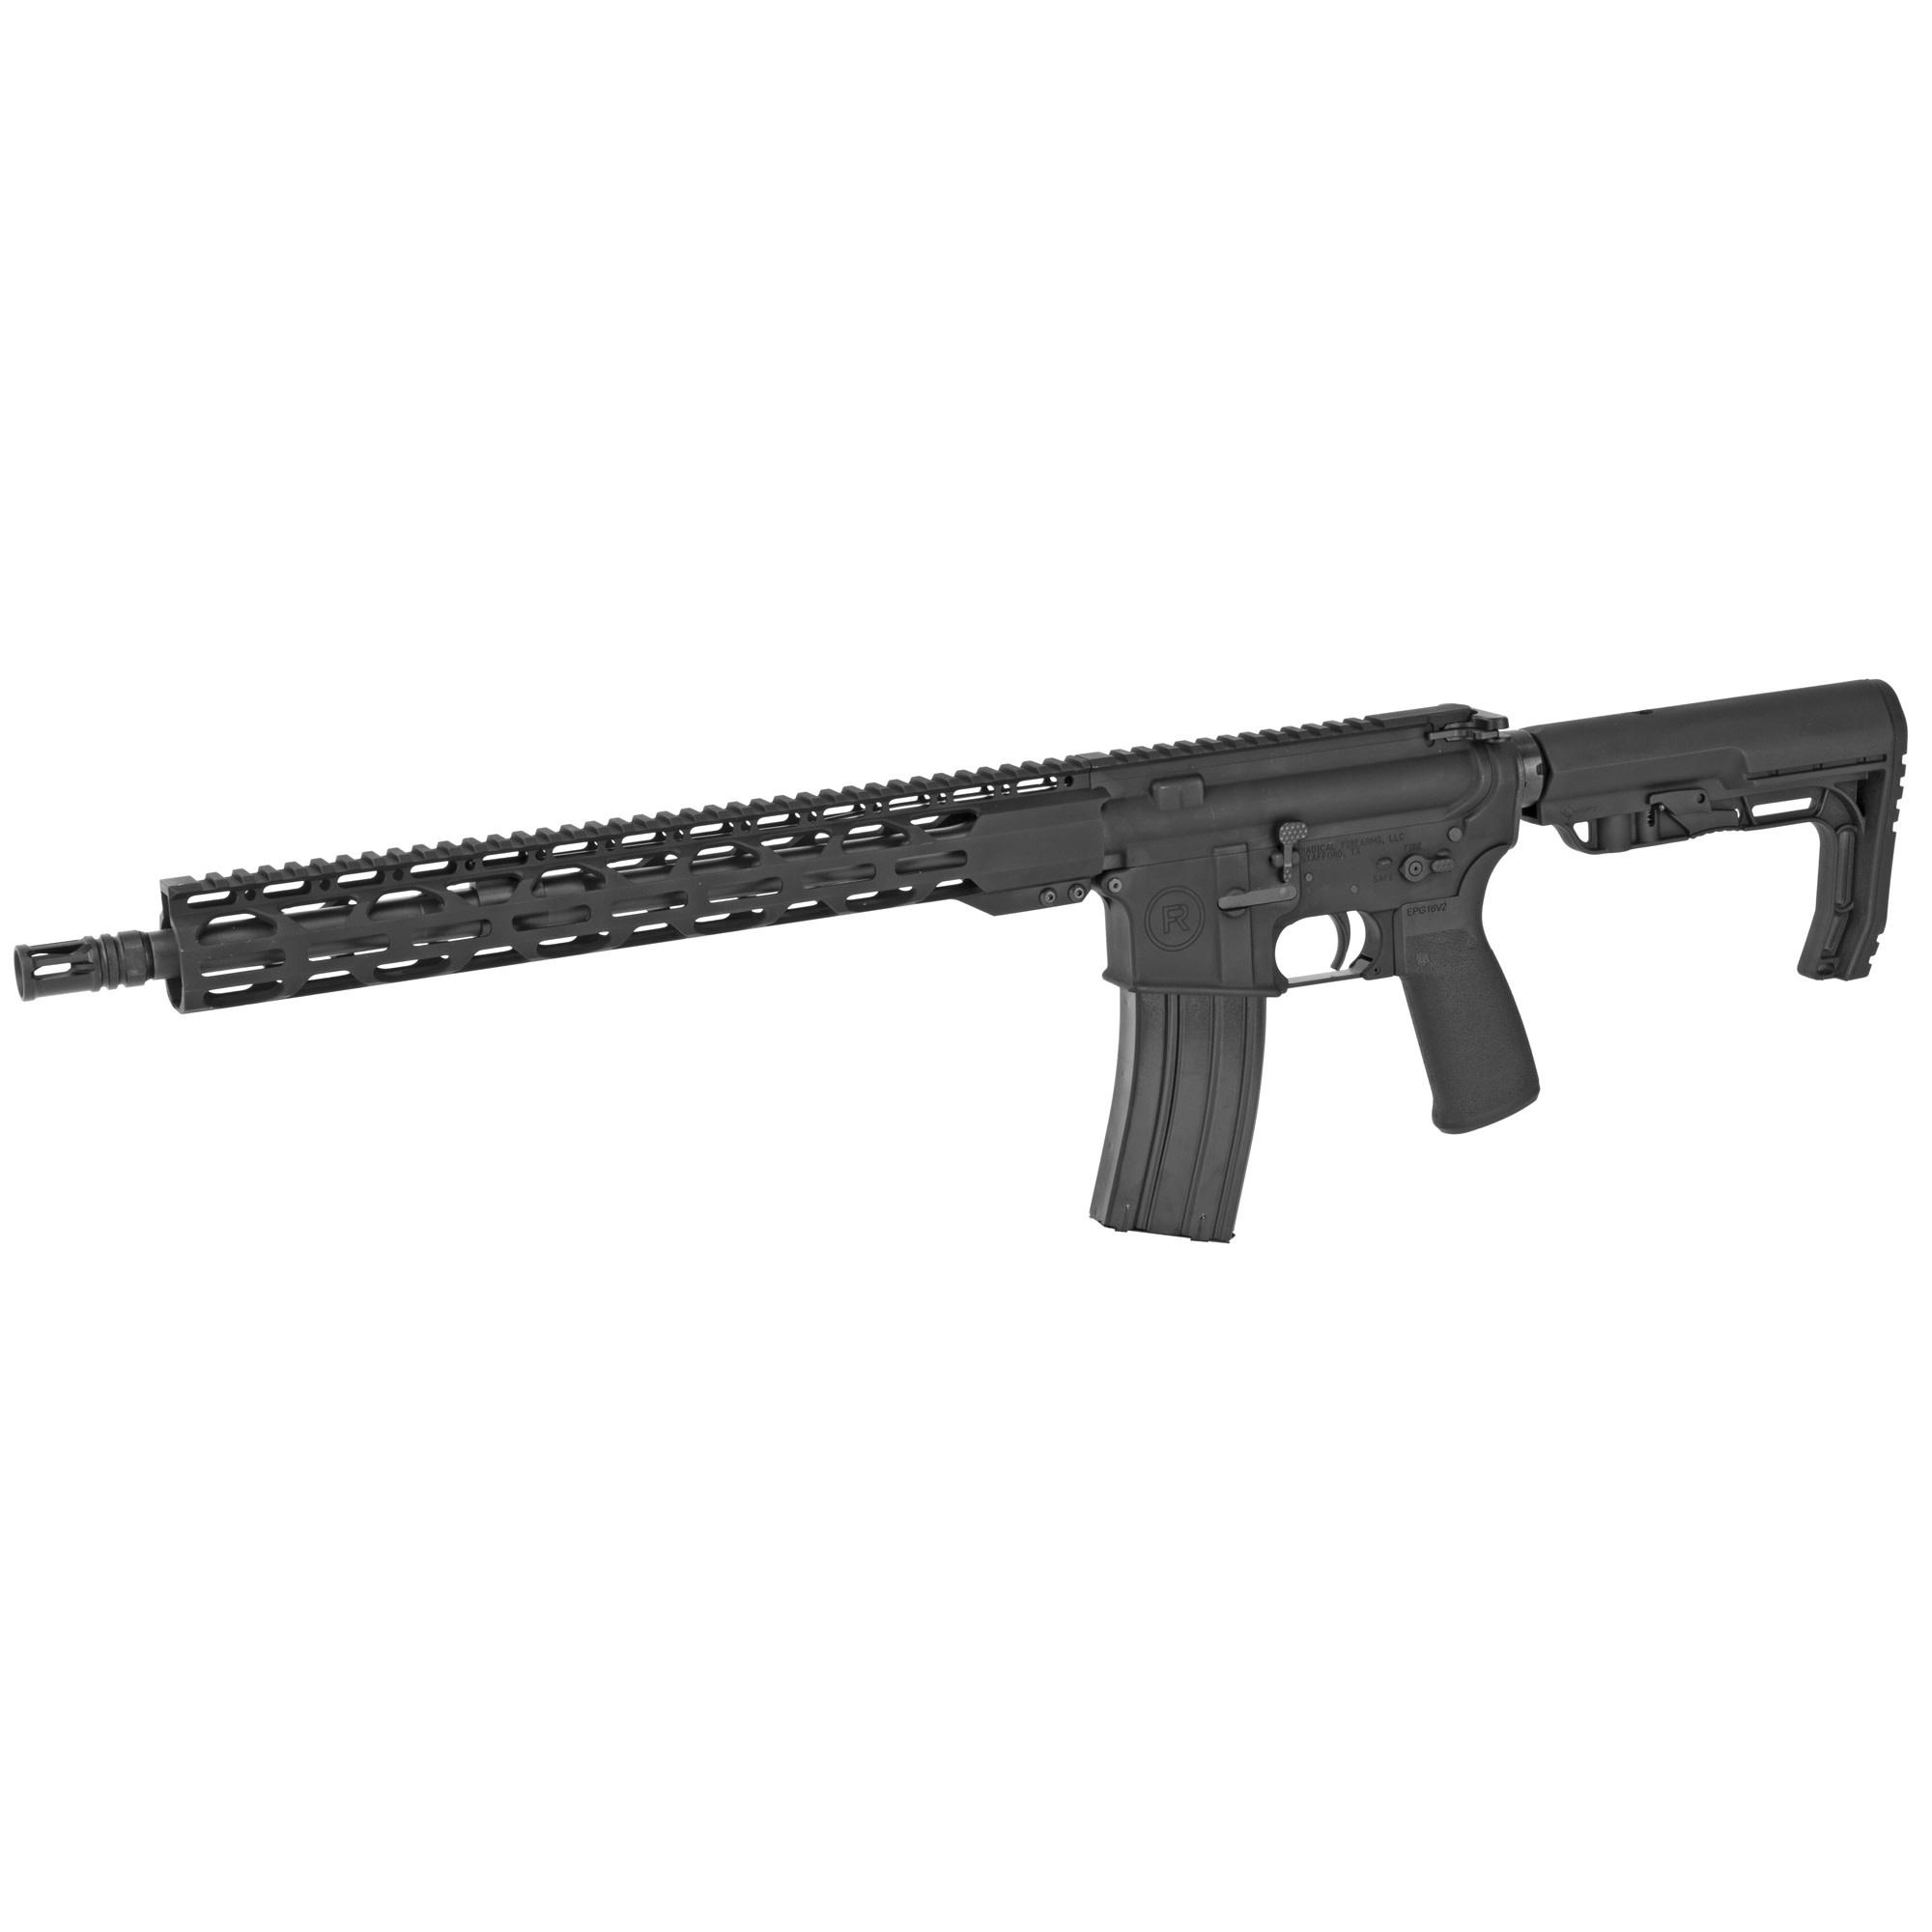 "Radical Firearms, Forged Milspec, 223/556, 16"" SOCOM Barrel, Black, MFT Minimalist Stock, 1 Magazine, 30Rd, 15"" MLOK Handguard"